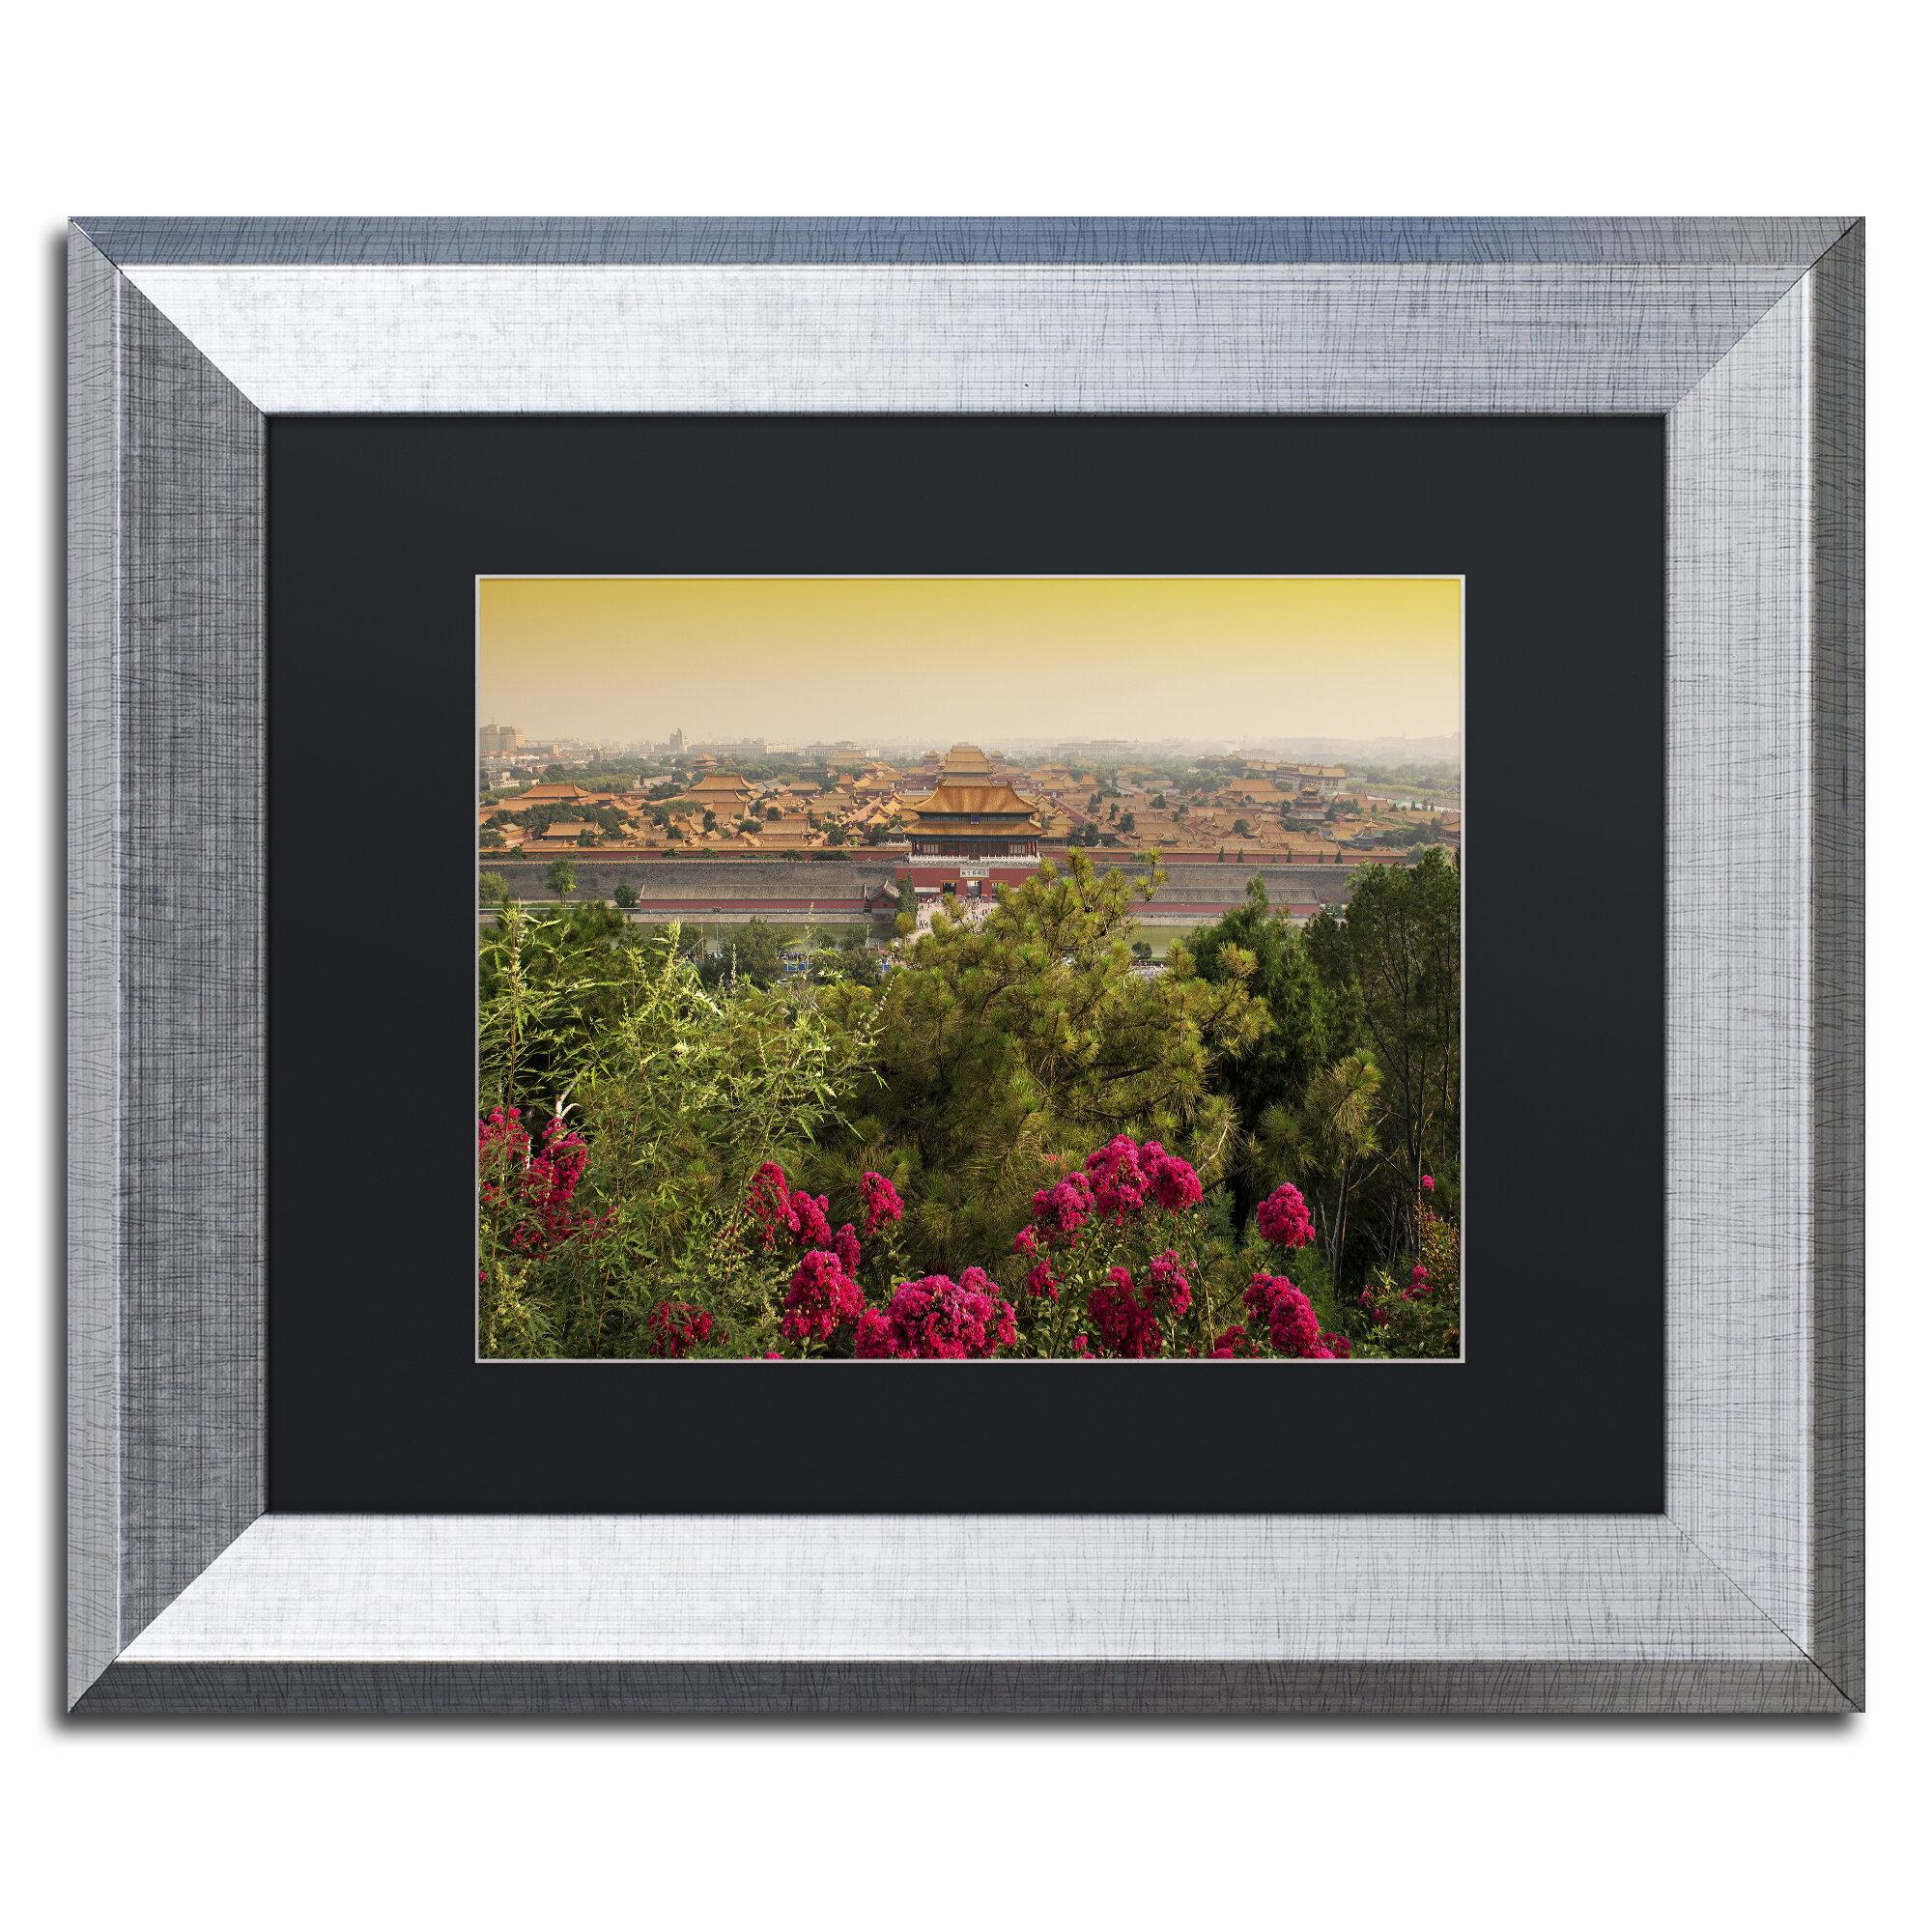 Trademark Art Rising Sun By Philippe Hugonnard Framed Photographic Print Wayfair